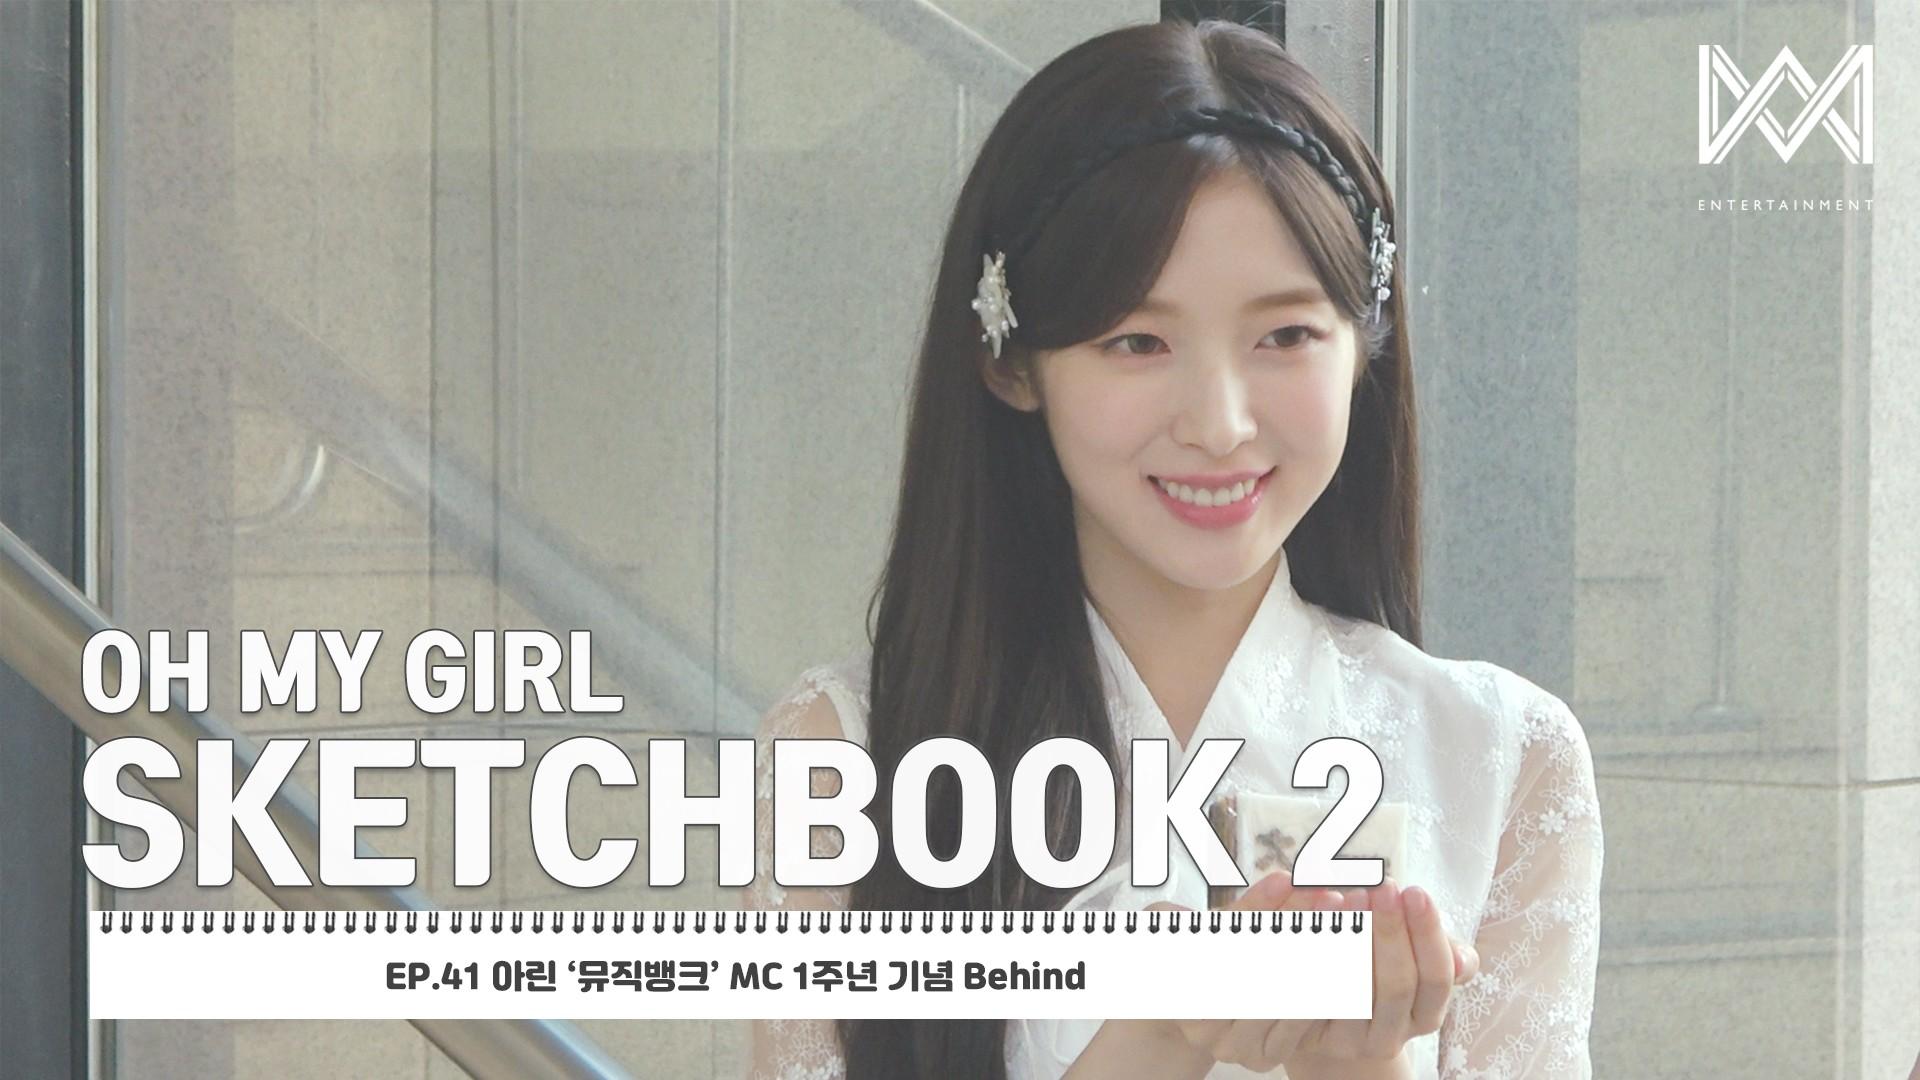 [OH MY GIRL SKETCHBOOK 2] EP.41 아린 '뮤직뱅크' MC 1주년 기념 Behind